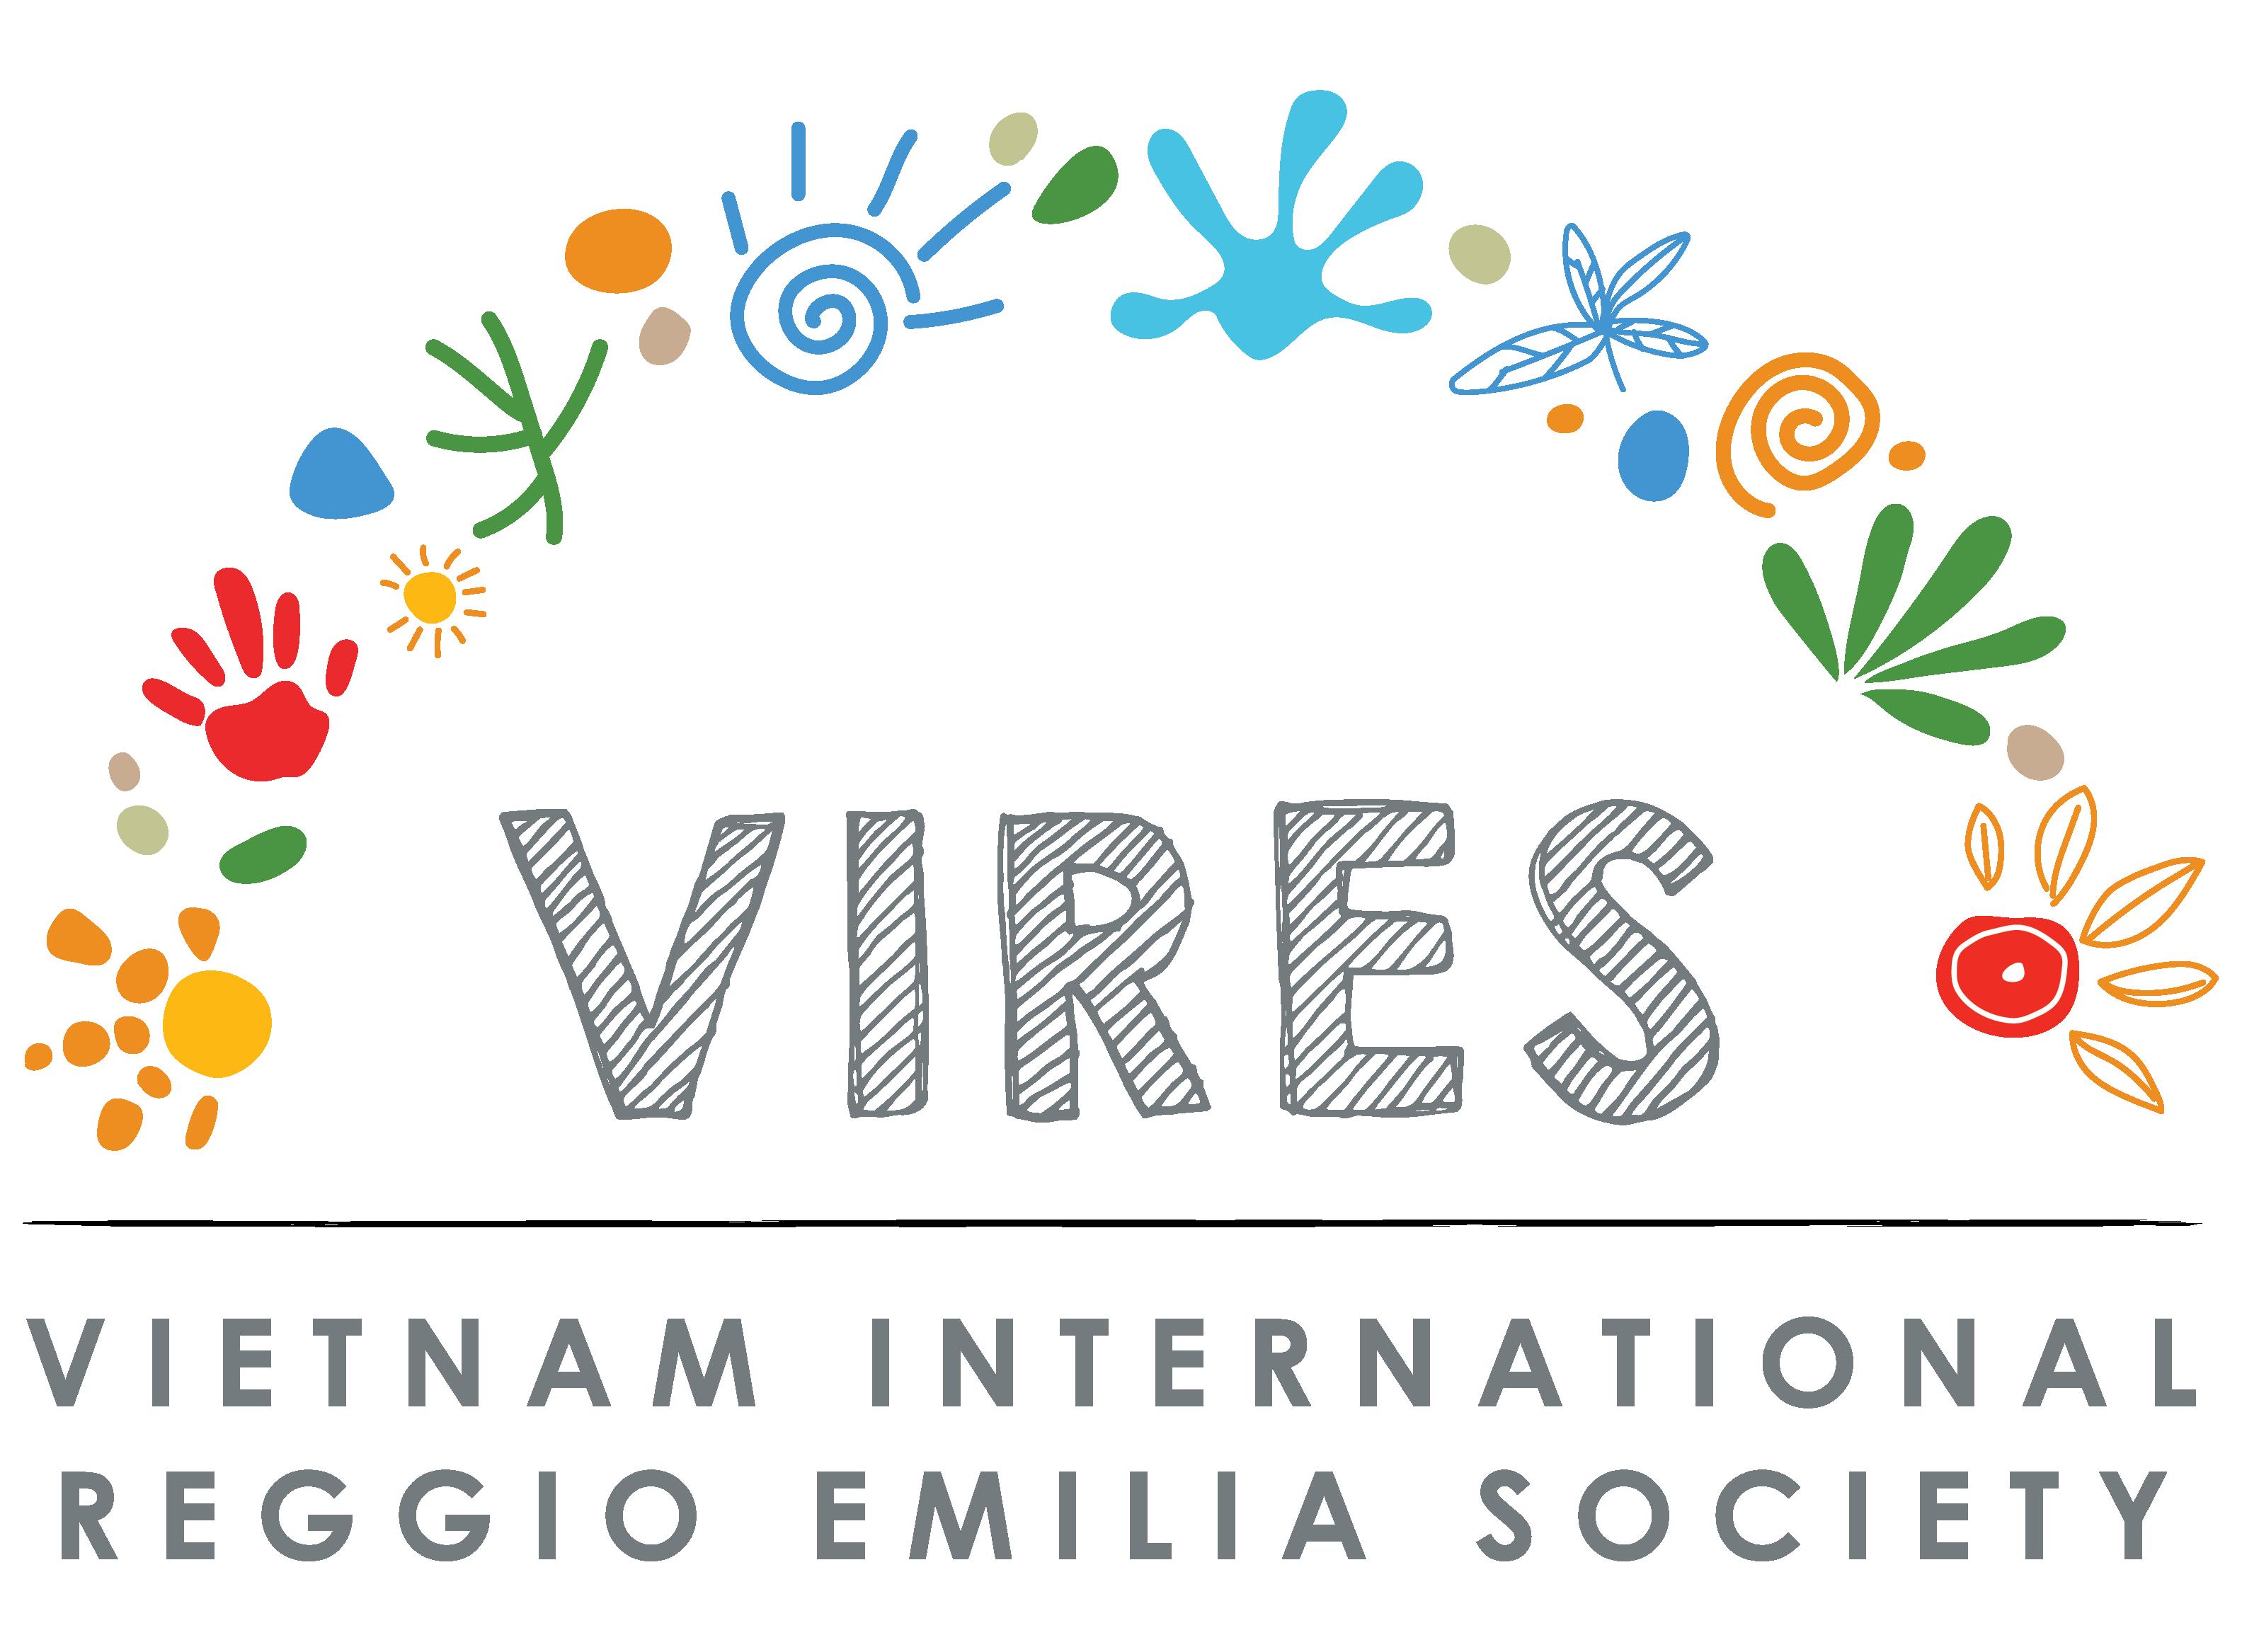 Vietnam International Reggio Emilia Society (VIRES)